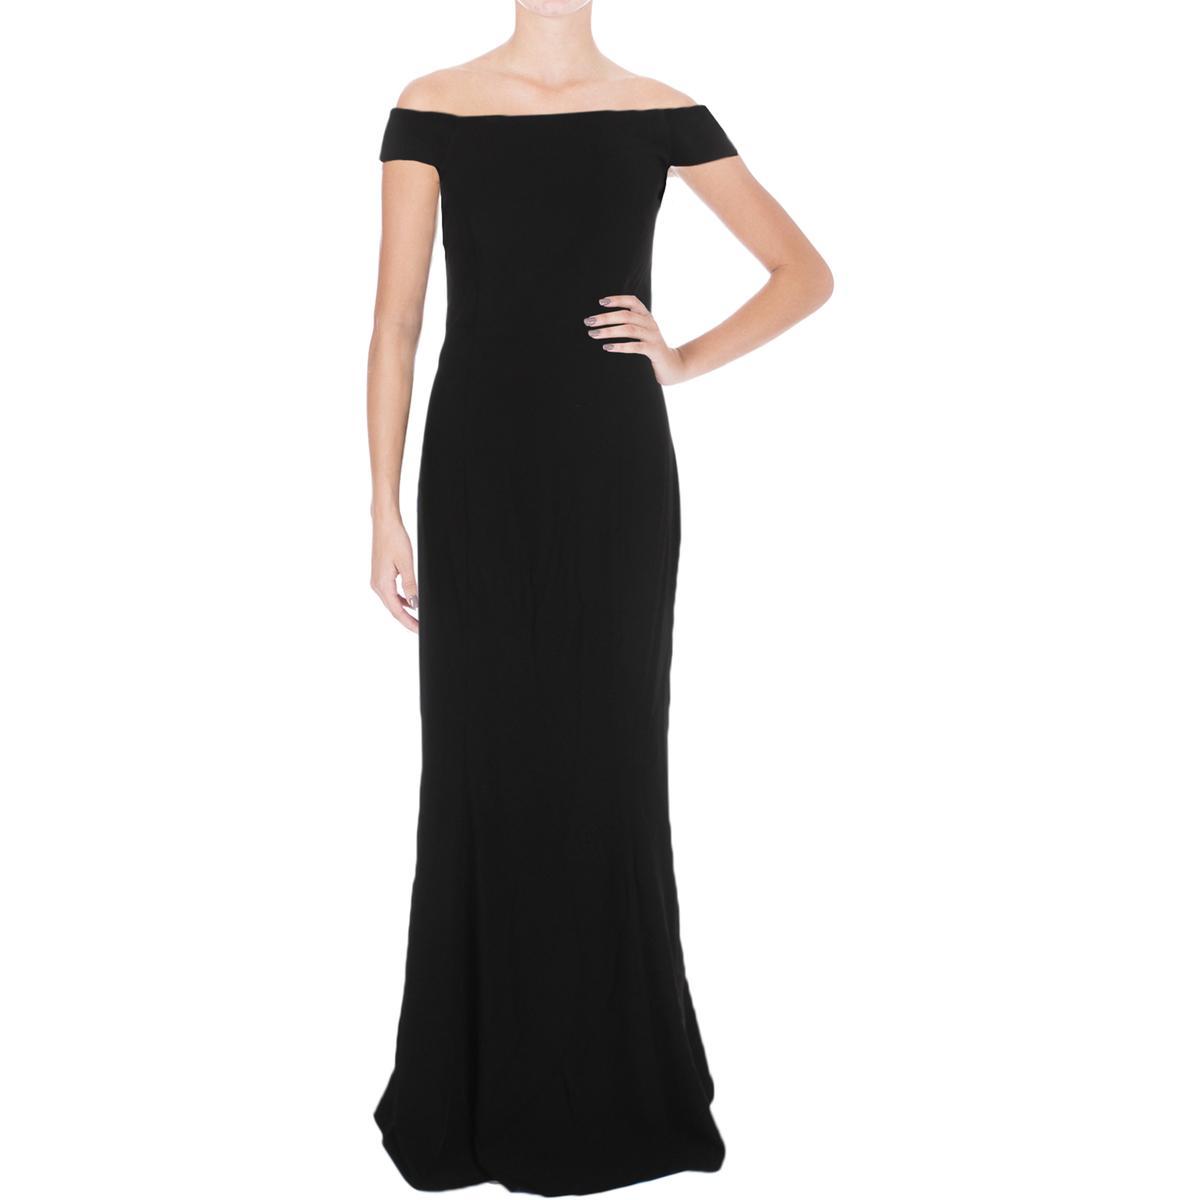 a2b2015ef4d1 Details about Laundry by Shelli Segal Womens Black Criss-Cross back Evening Dress  8 BHFO 2812